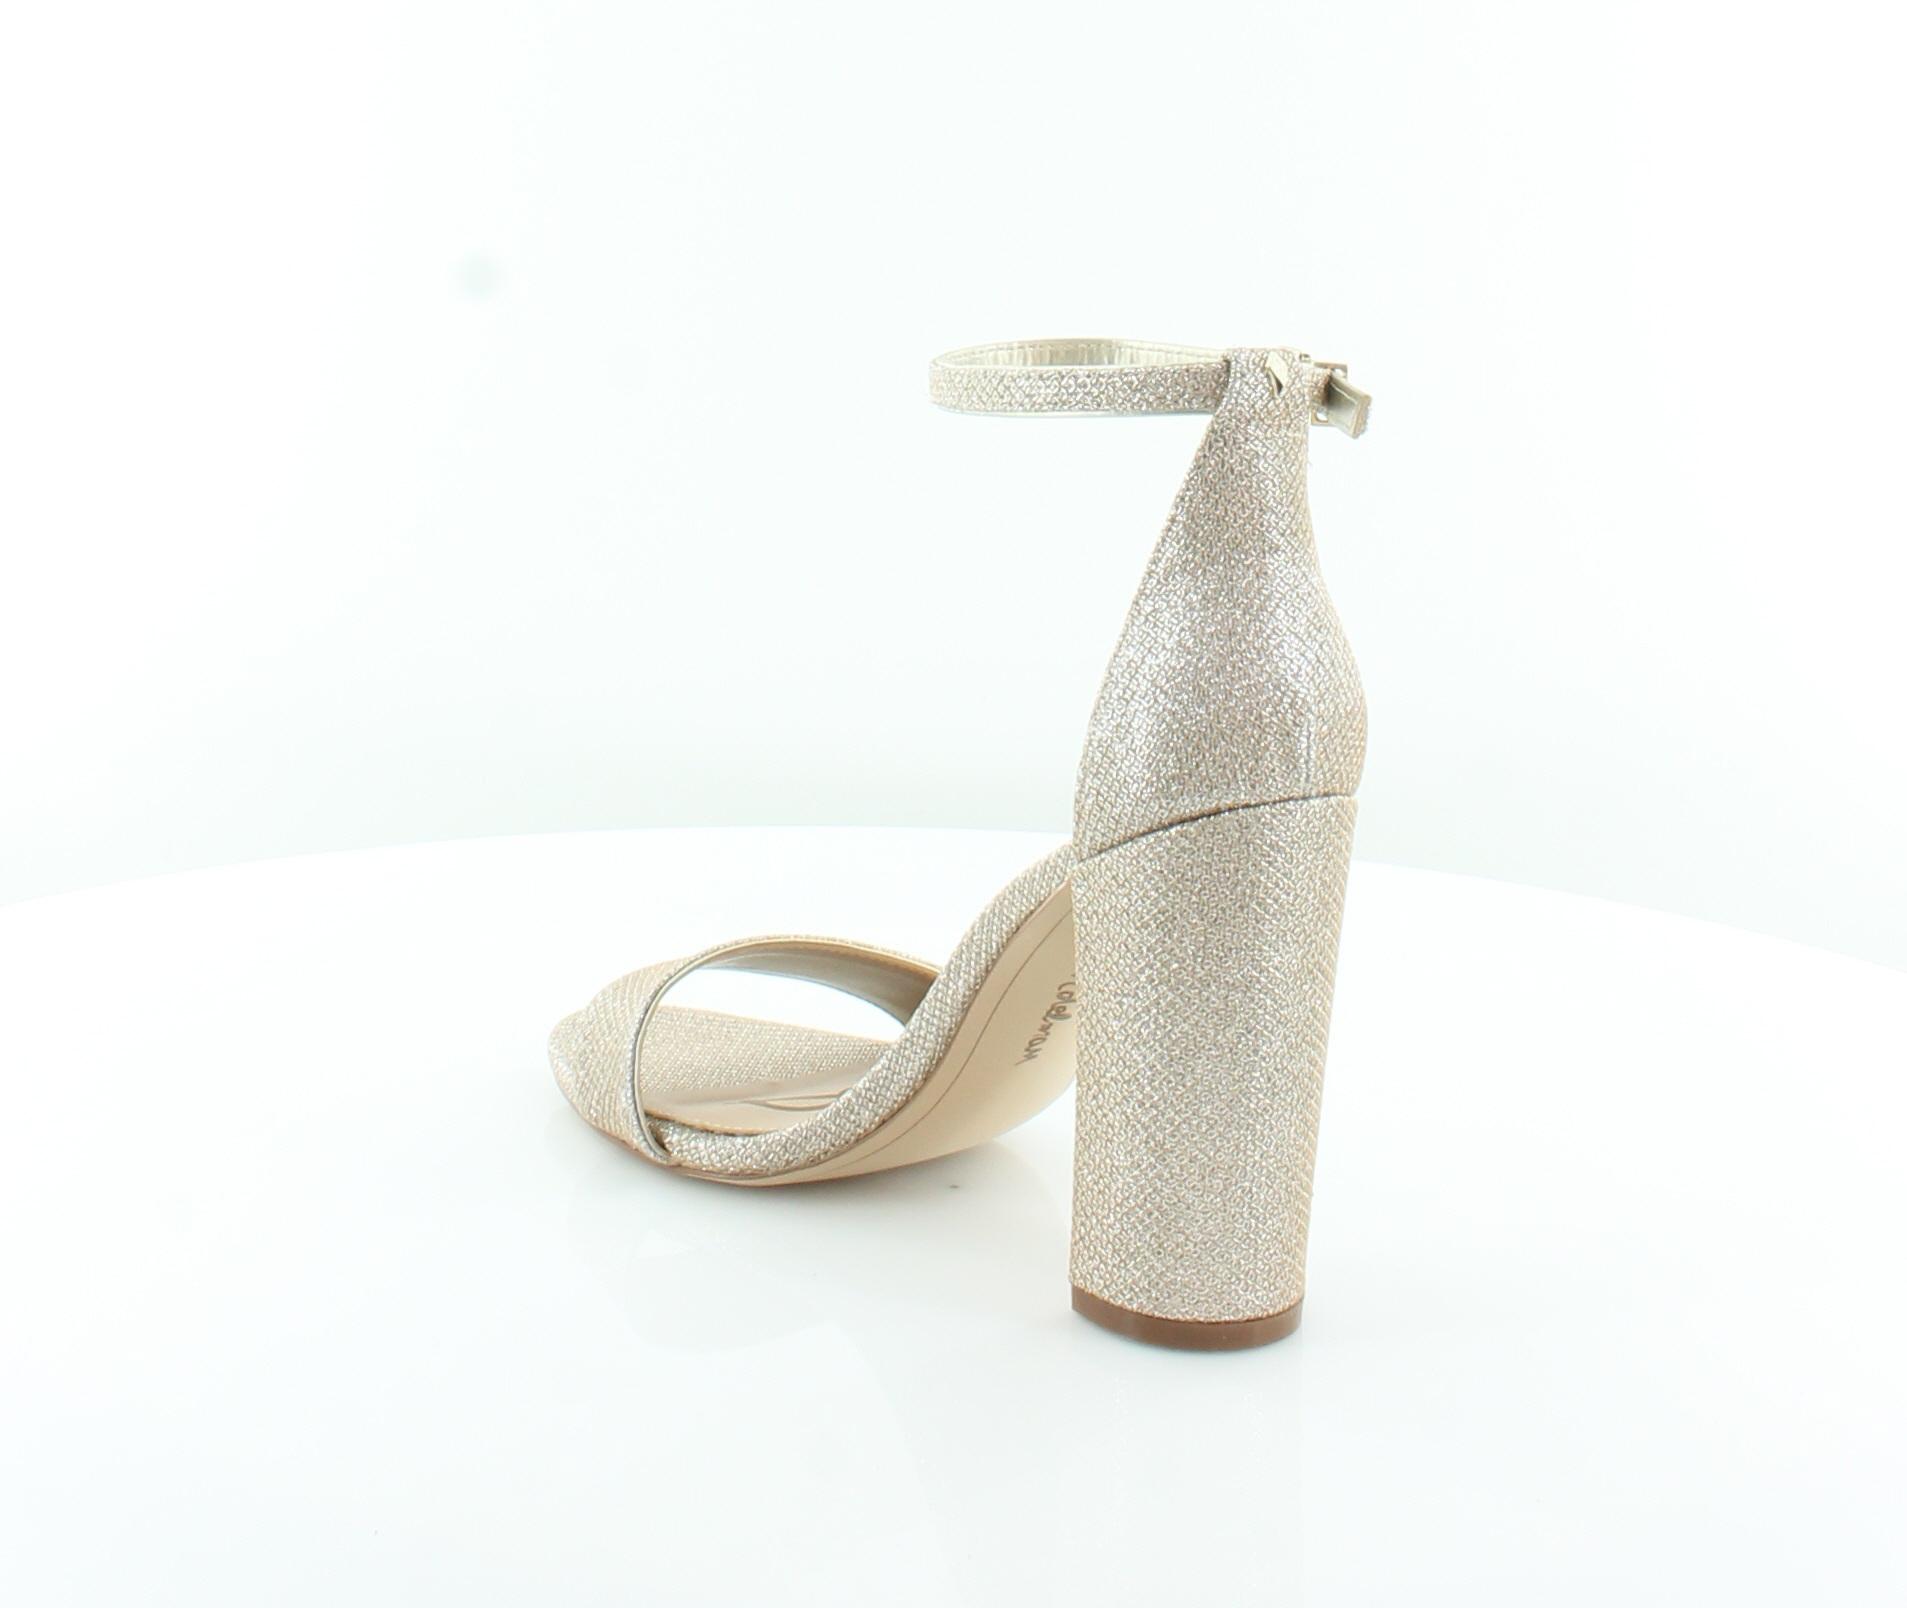 Sam Edelman New Yaro Gold damen schuhe schuhe schuhe Größe 7.5 M Sandals MSRP  120 e5f4d8